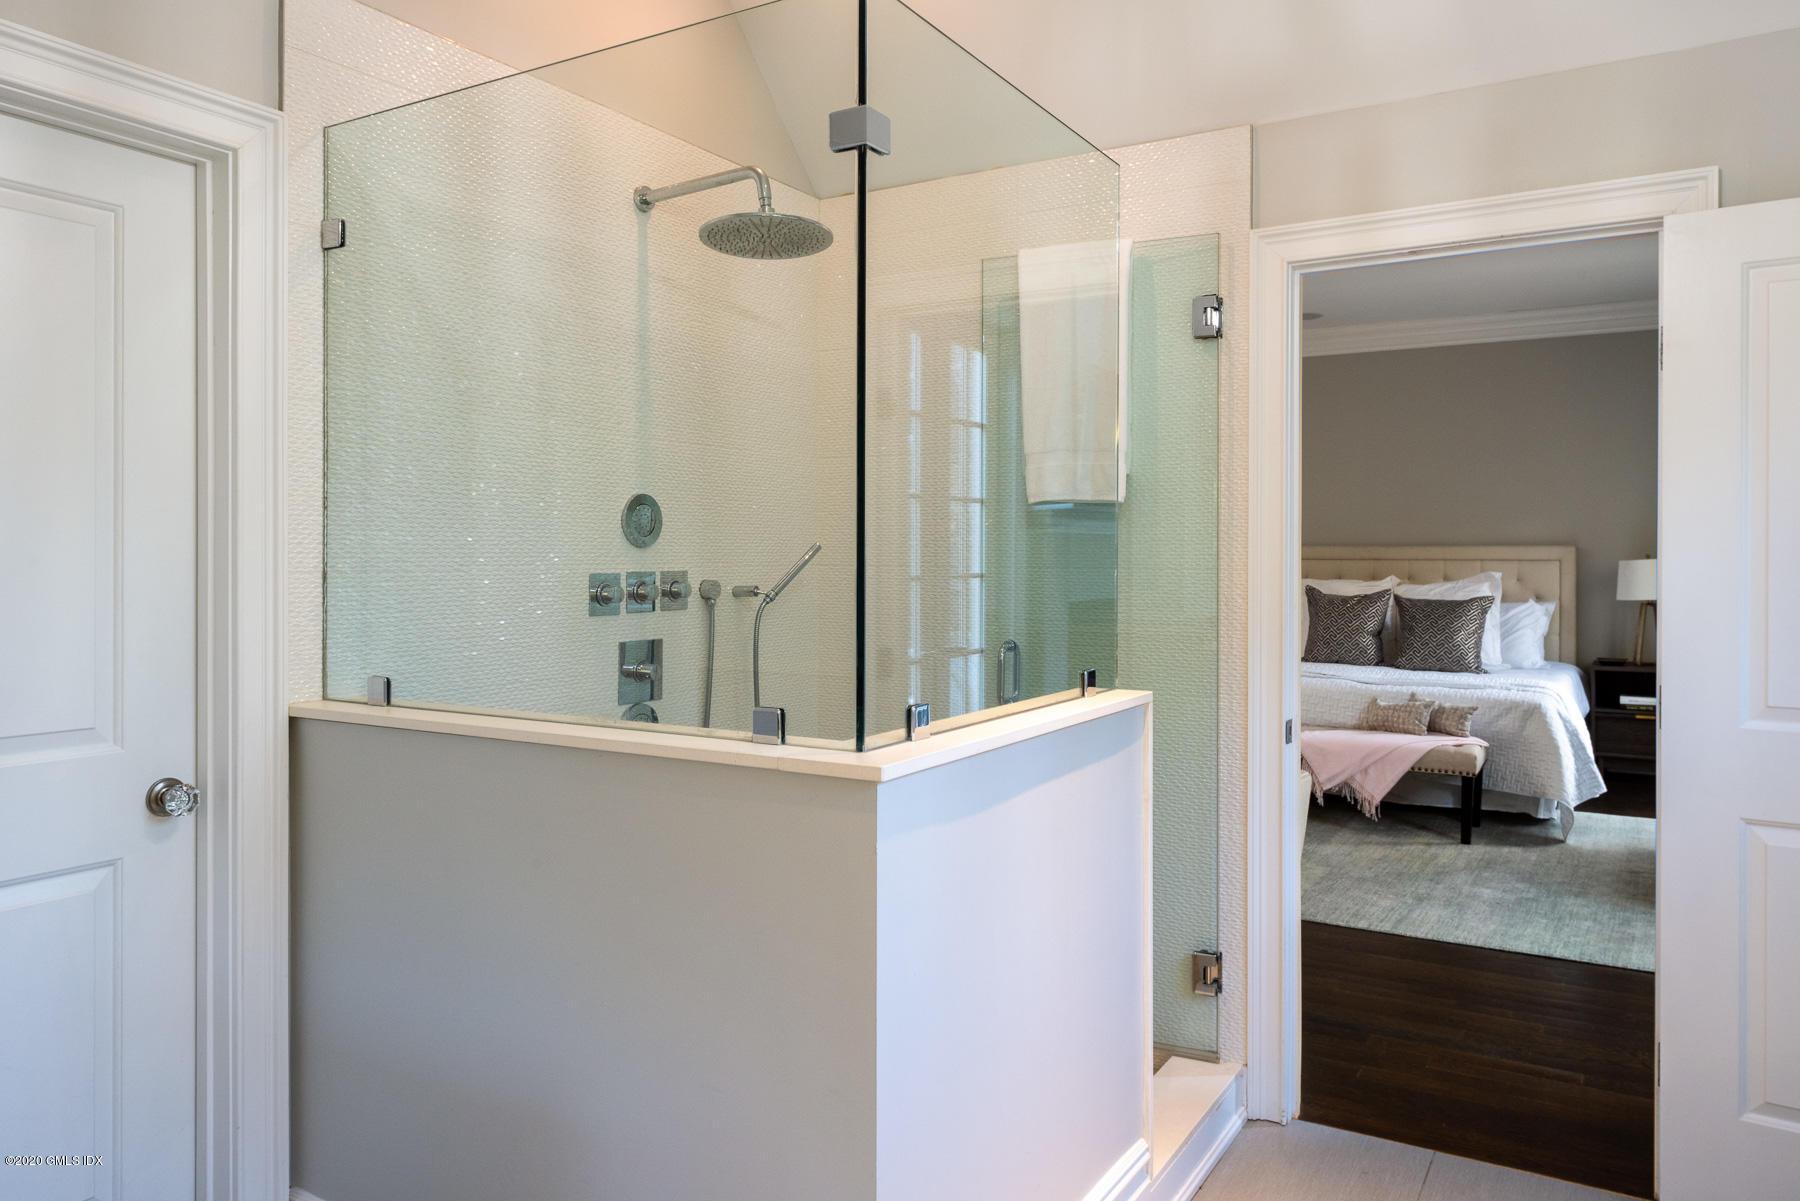 16 Binney Lane, Old Greenwich, Connecticut 06870, 5 Bedrooms Bedrooms, ,5 BathroomsBathrooms,Single family,For sale,Binney,110157